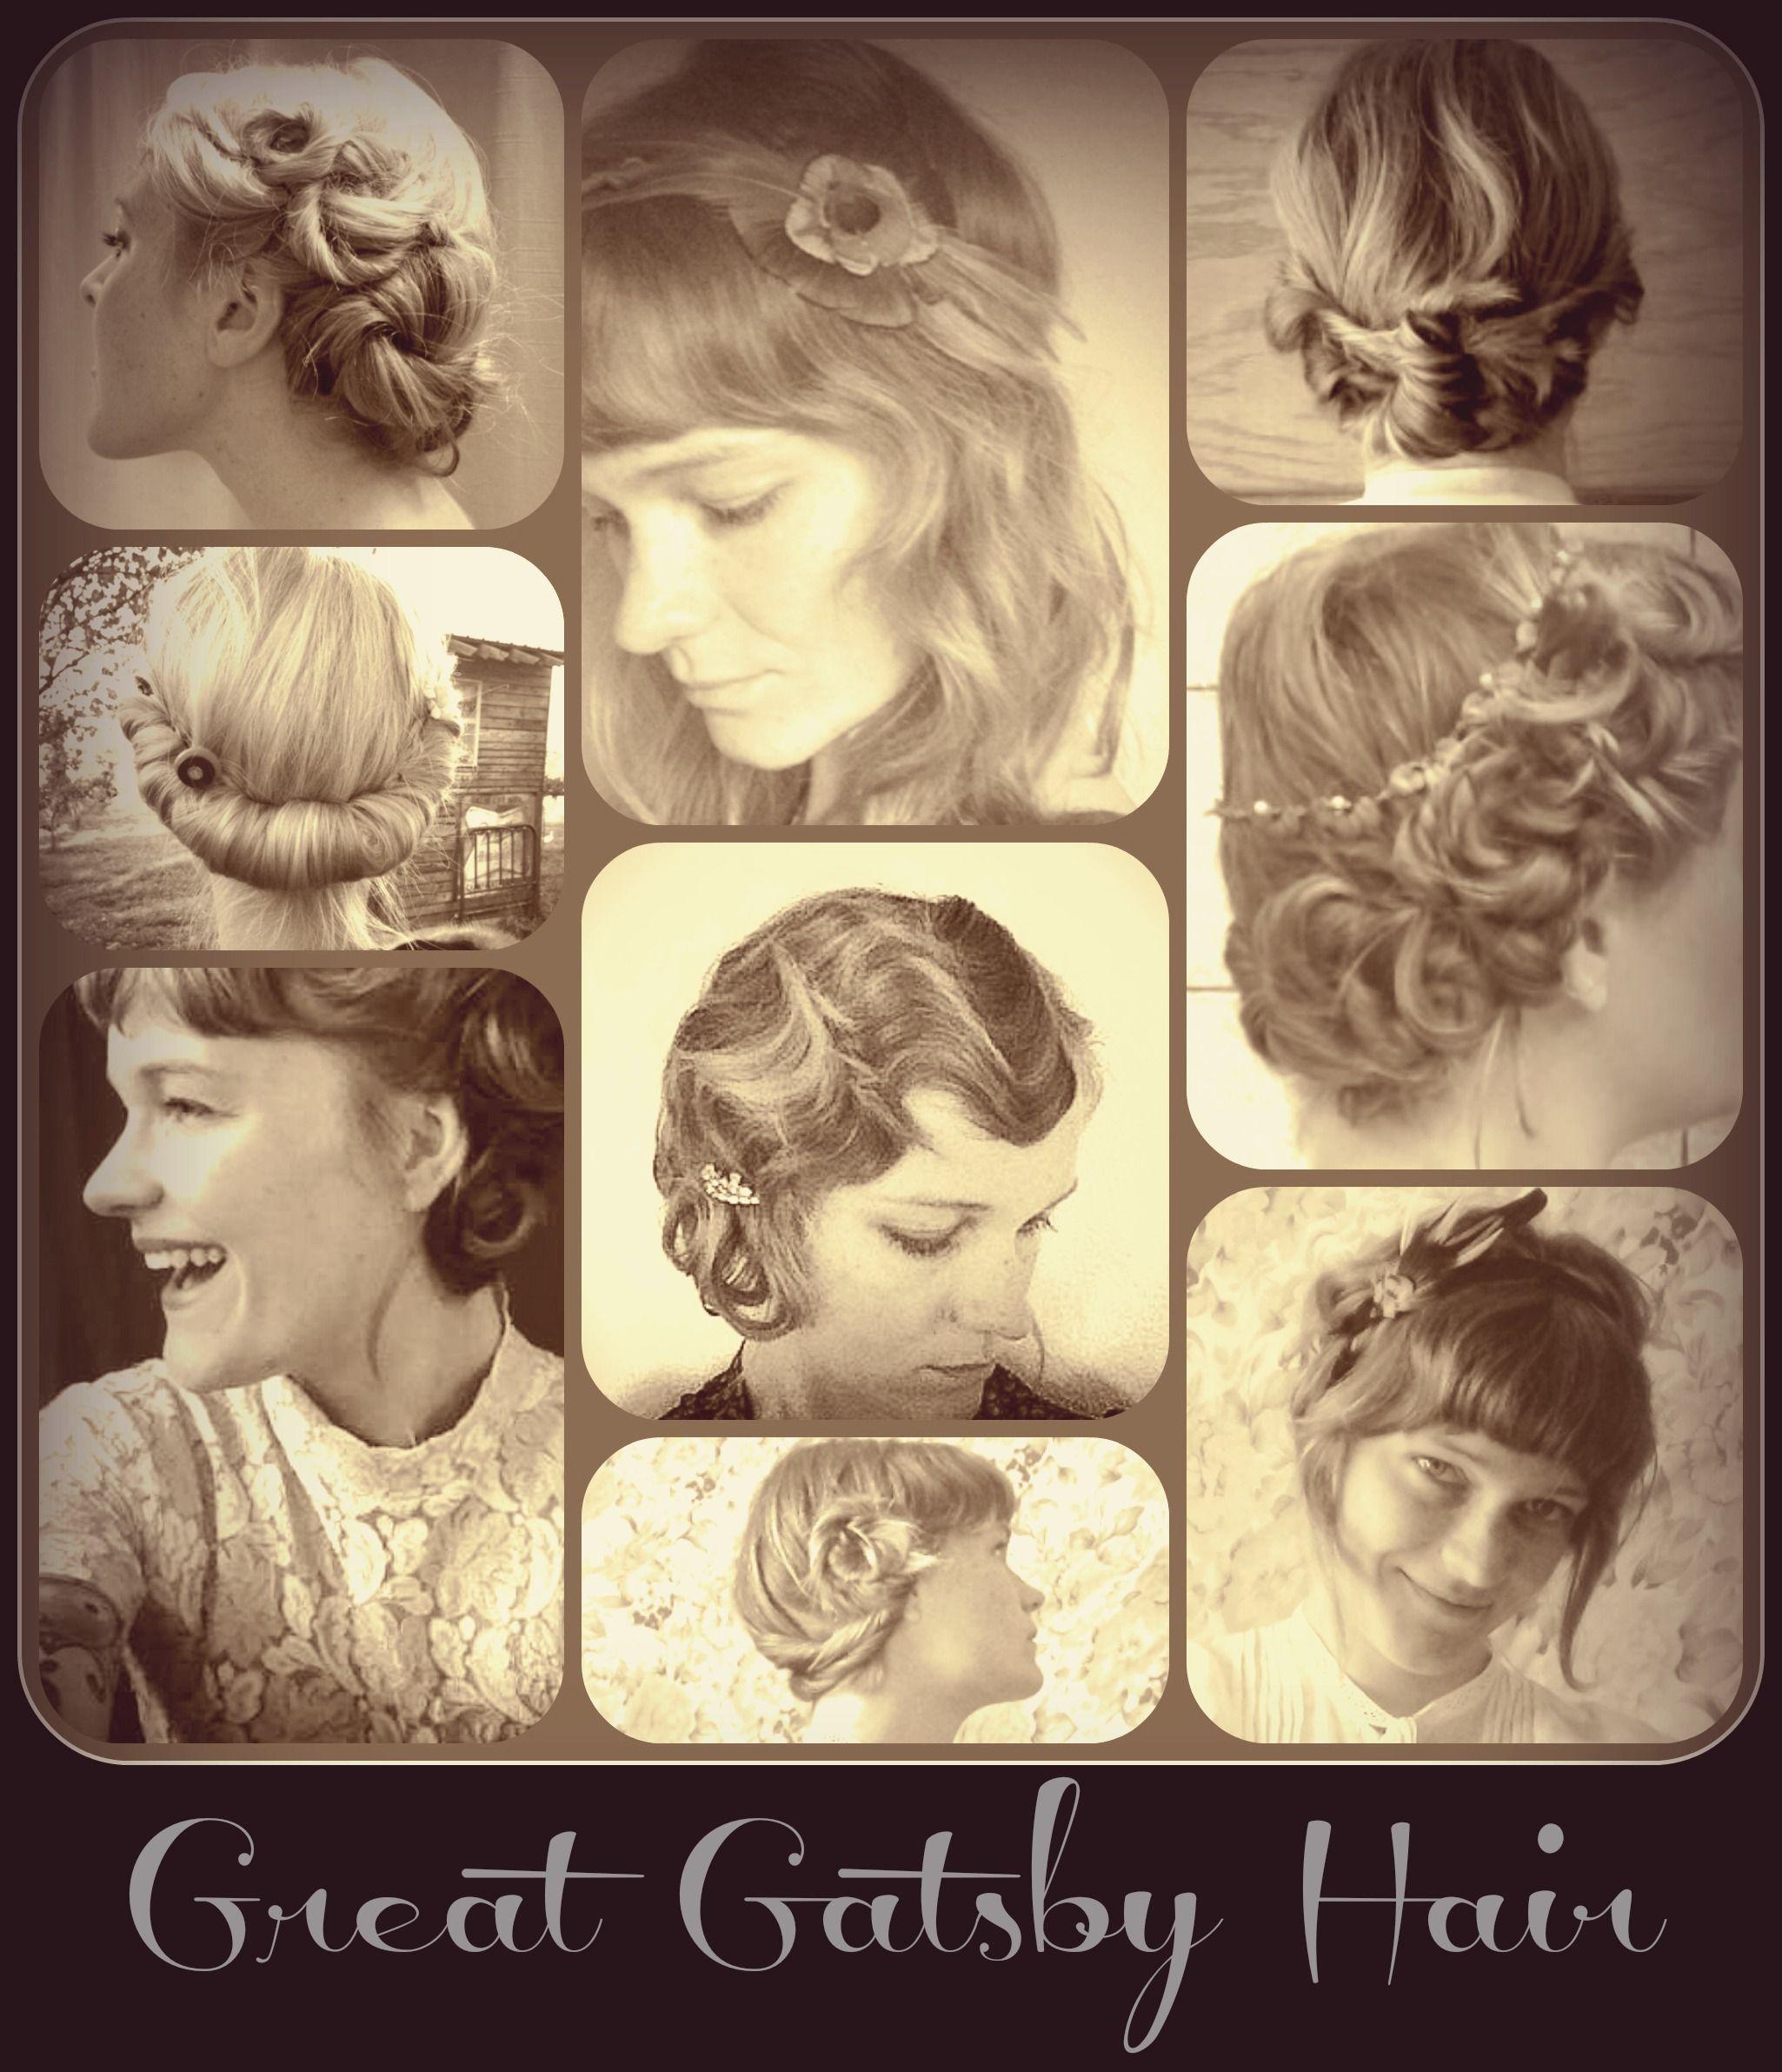 great hair gatsby style